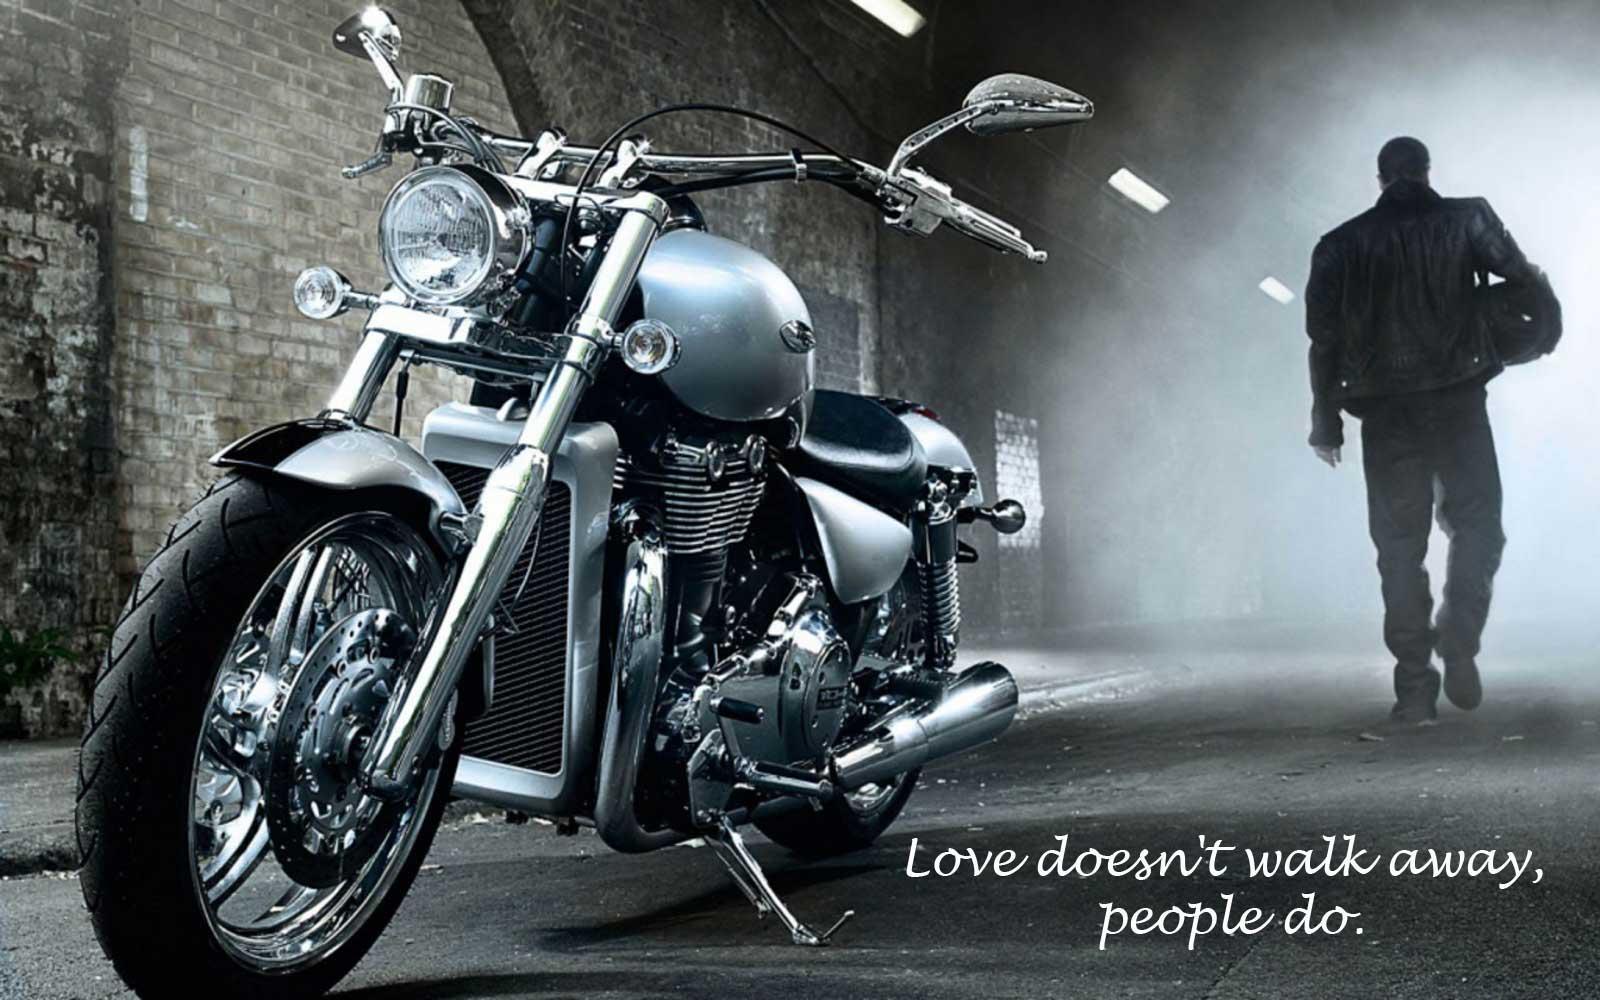 Love doesn't walk away, people do.